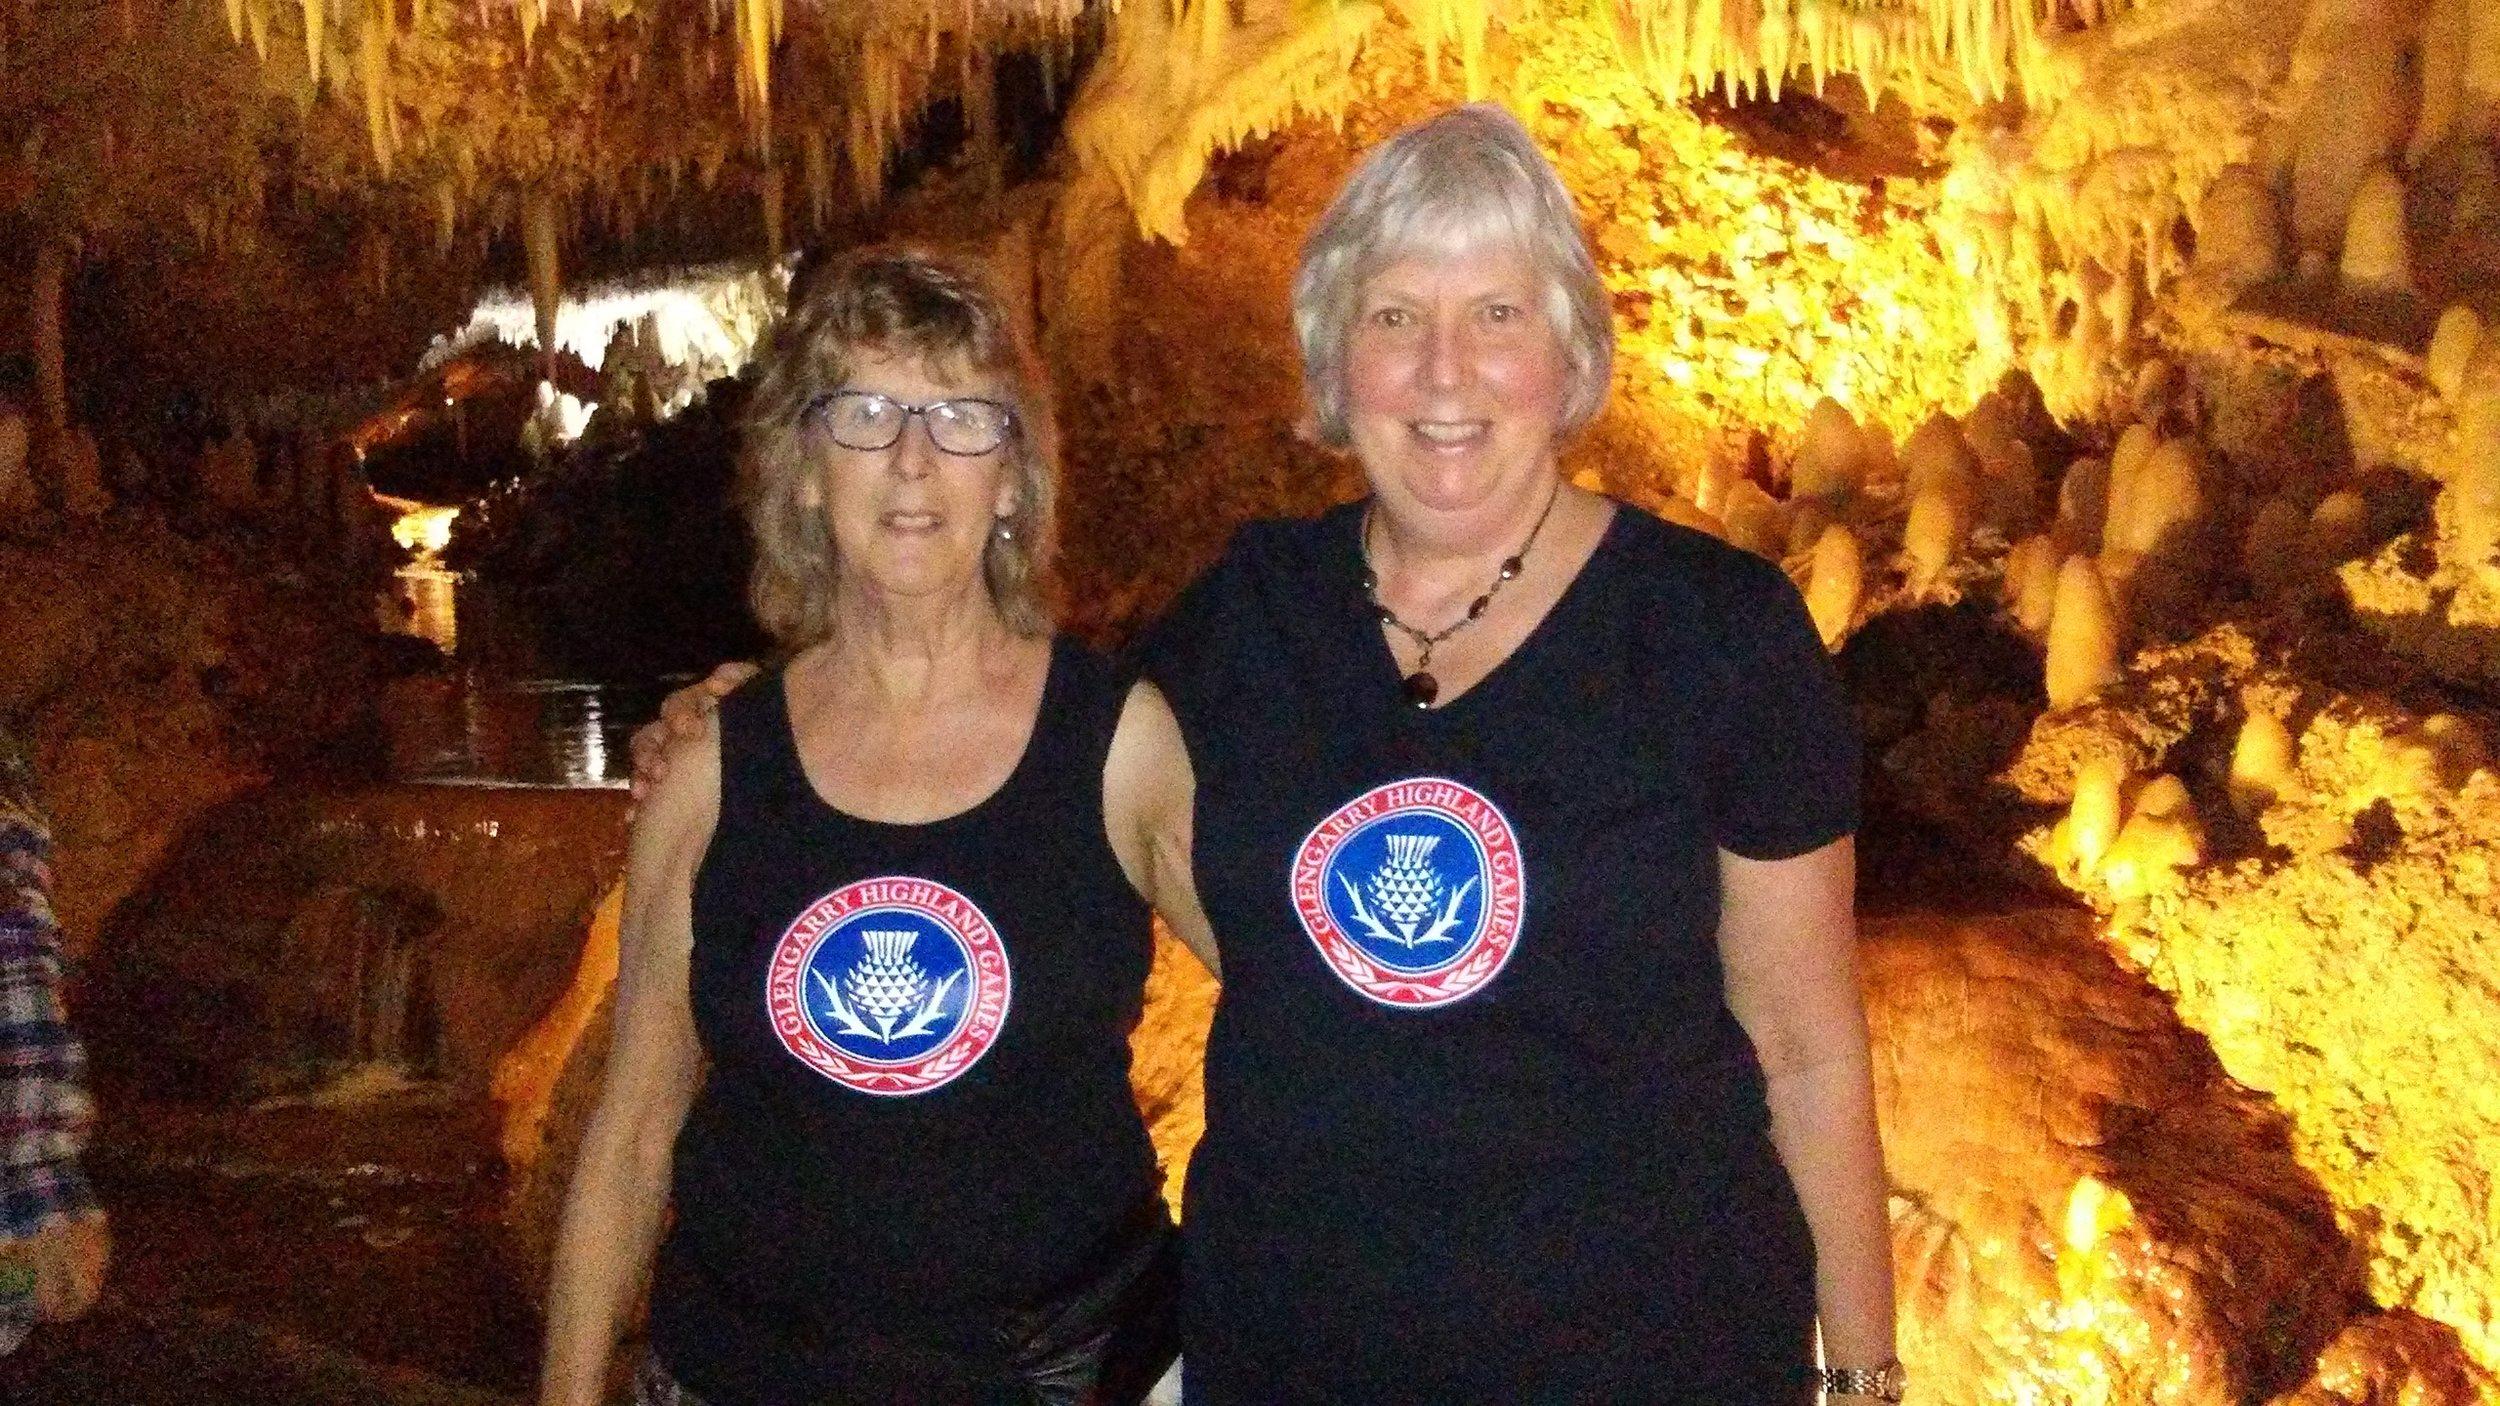 Karen and Susan Brown in Barbados for March break.